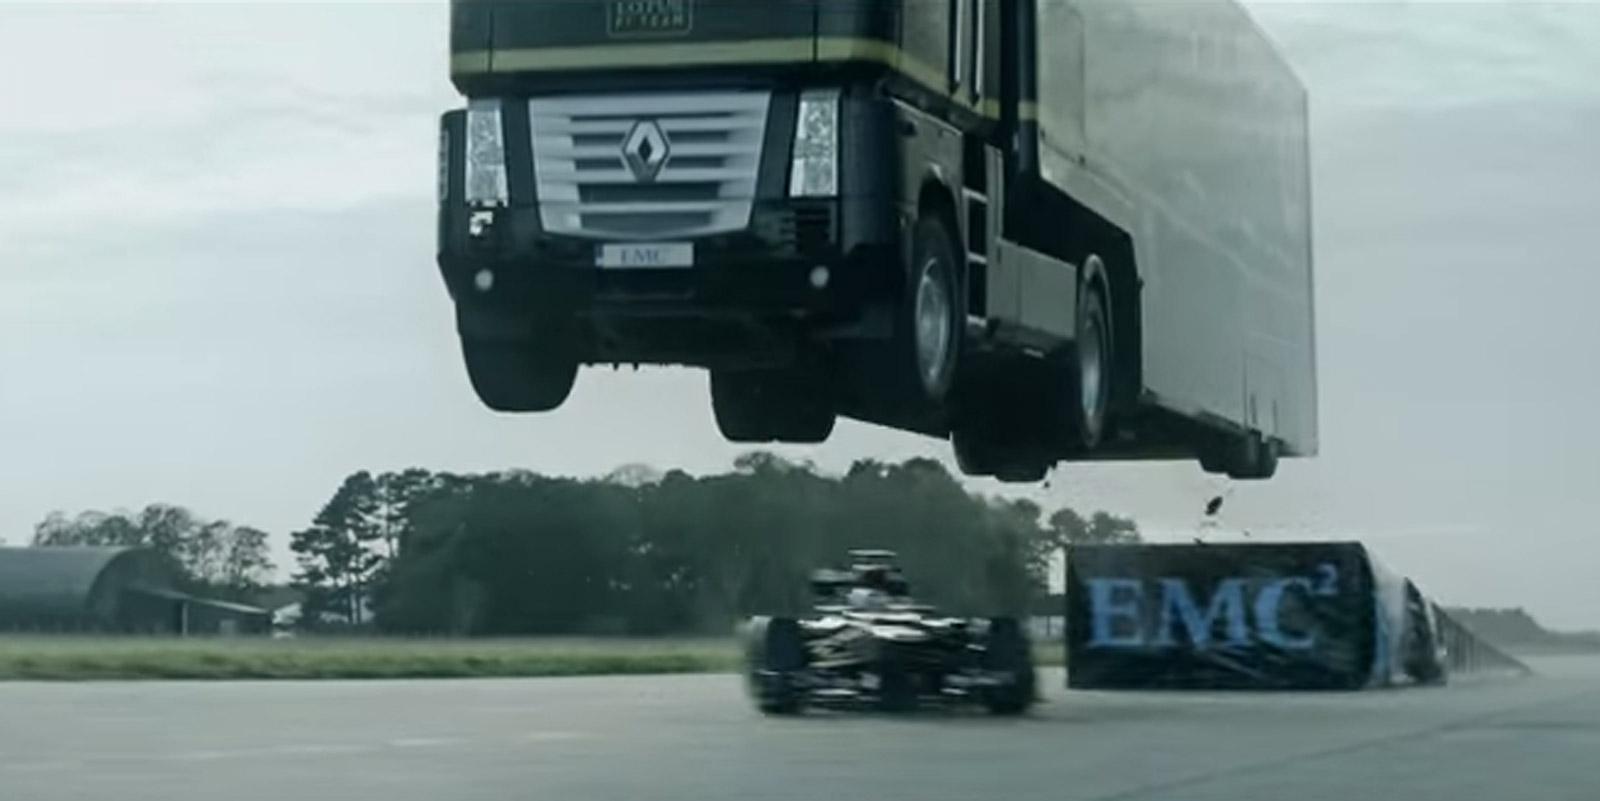 Watch A Big Rig Jump A Moving Formula One Car: Video